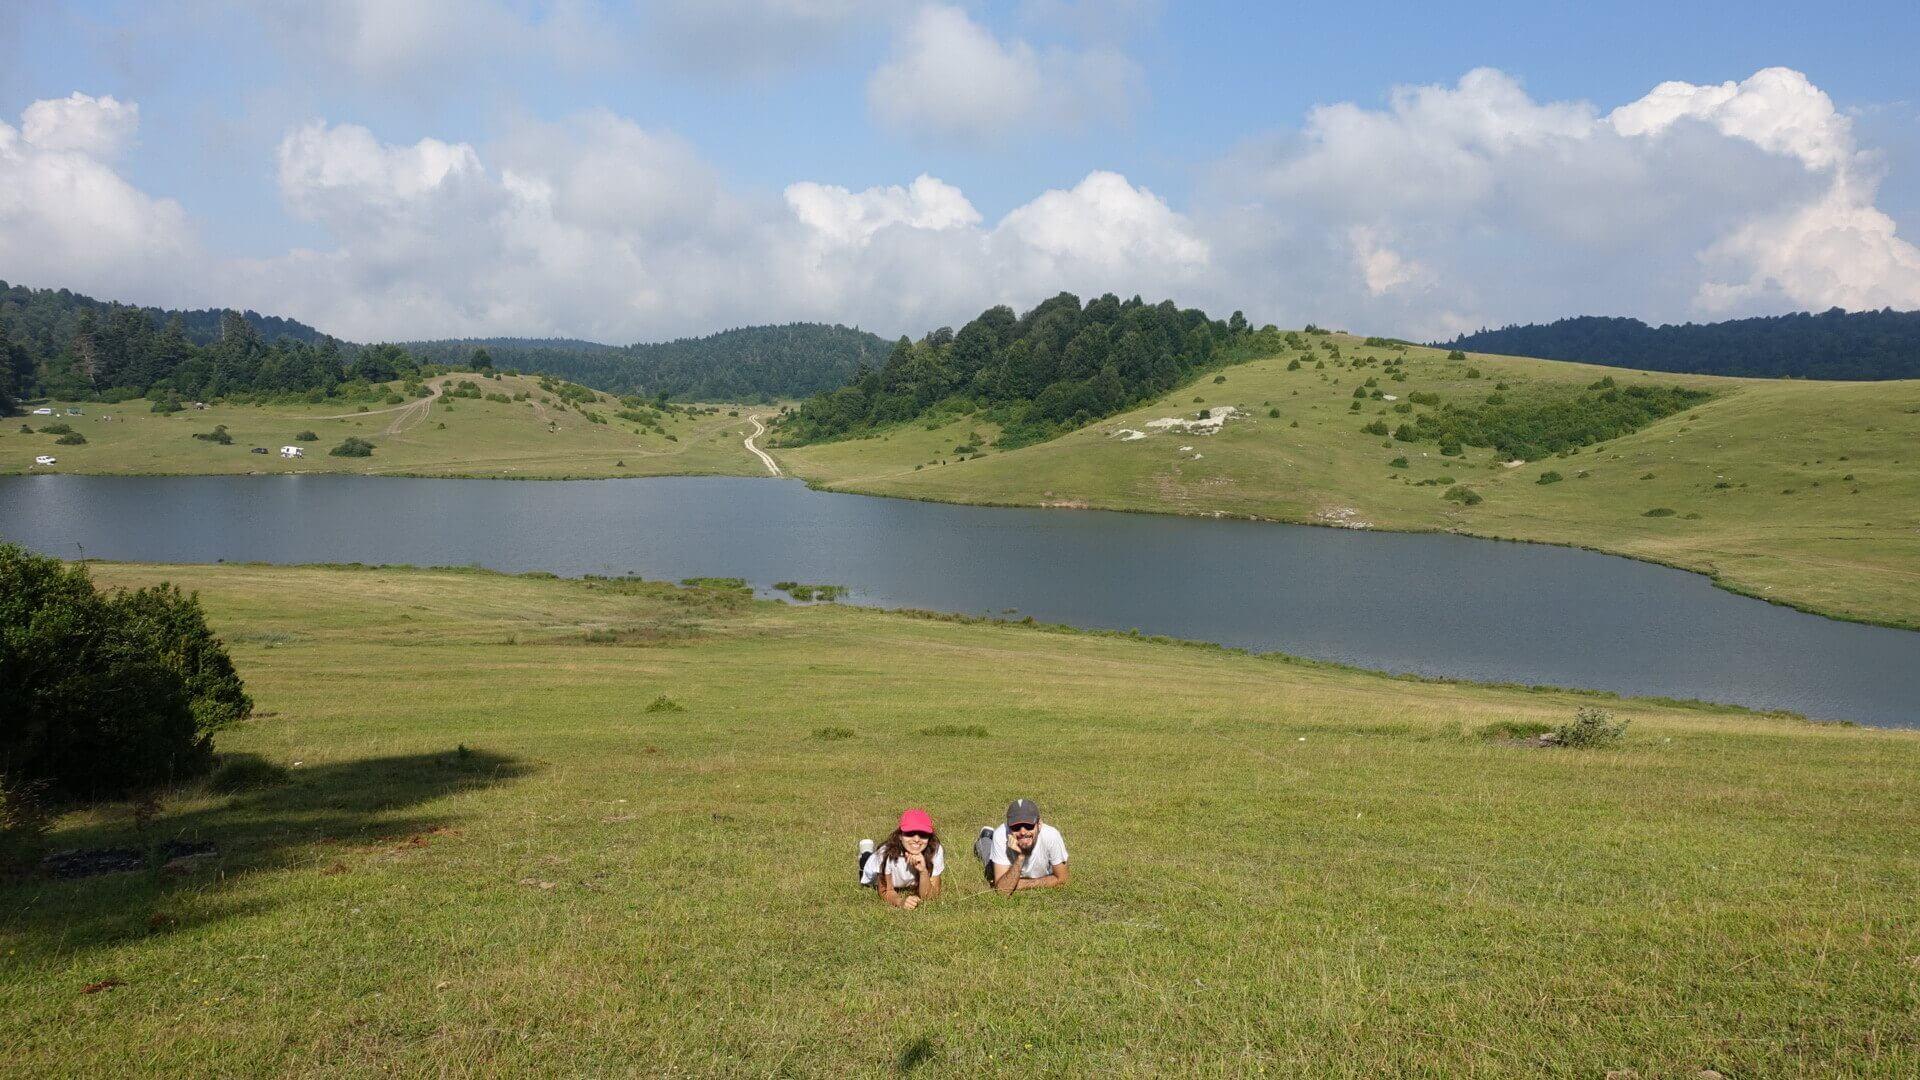 Sultanpınar Yaylası Camping area is in Bolu, only three hours away from Istanbul. (Image Credit-Evim Doğa)